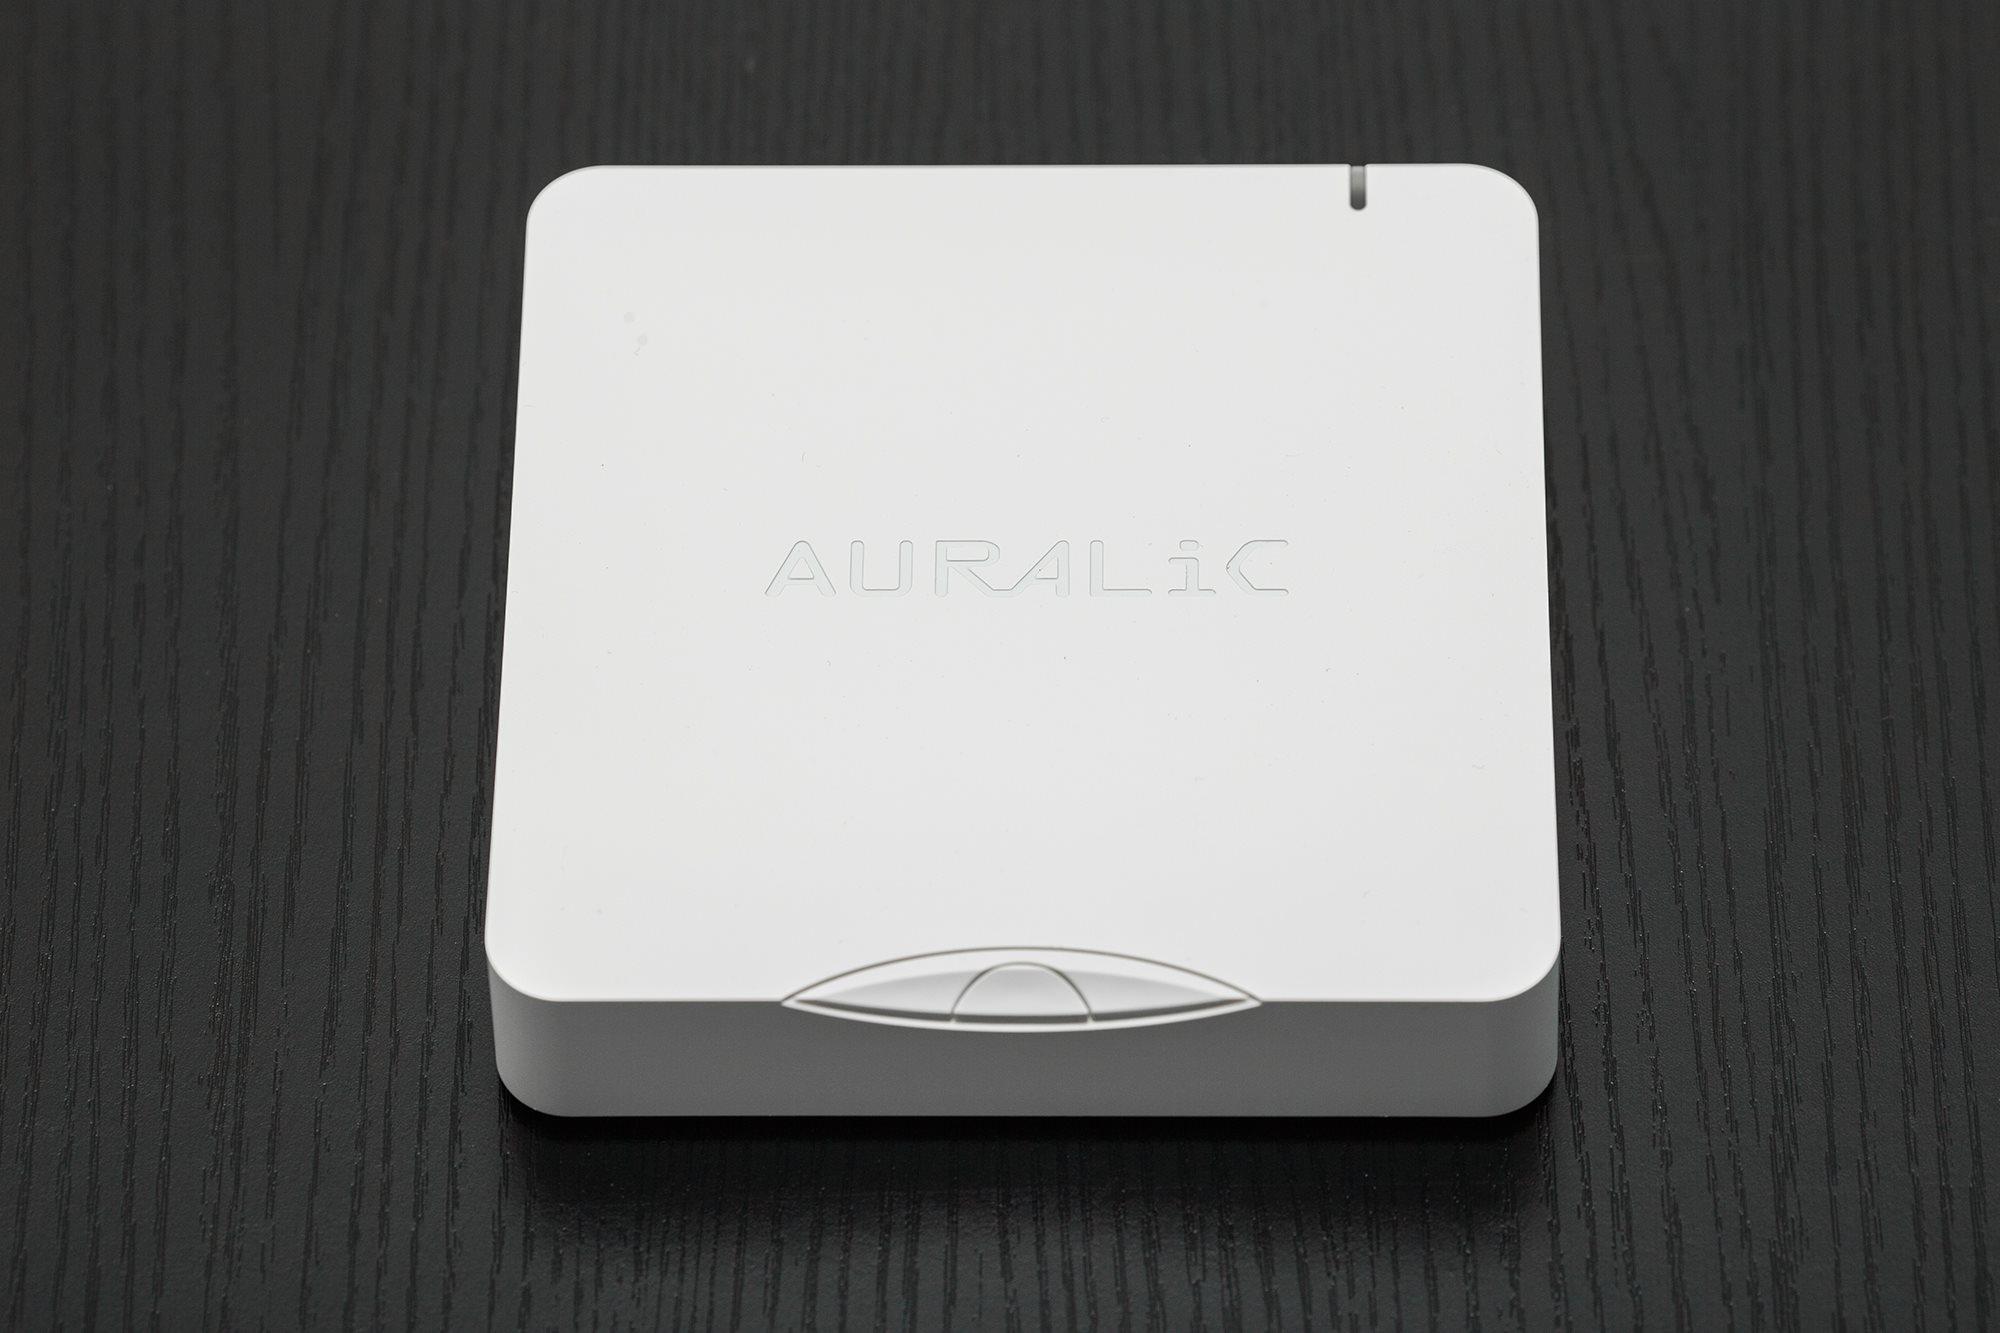 AURALiC Aries Mini Australia